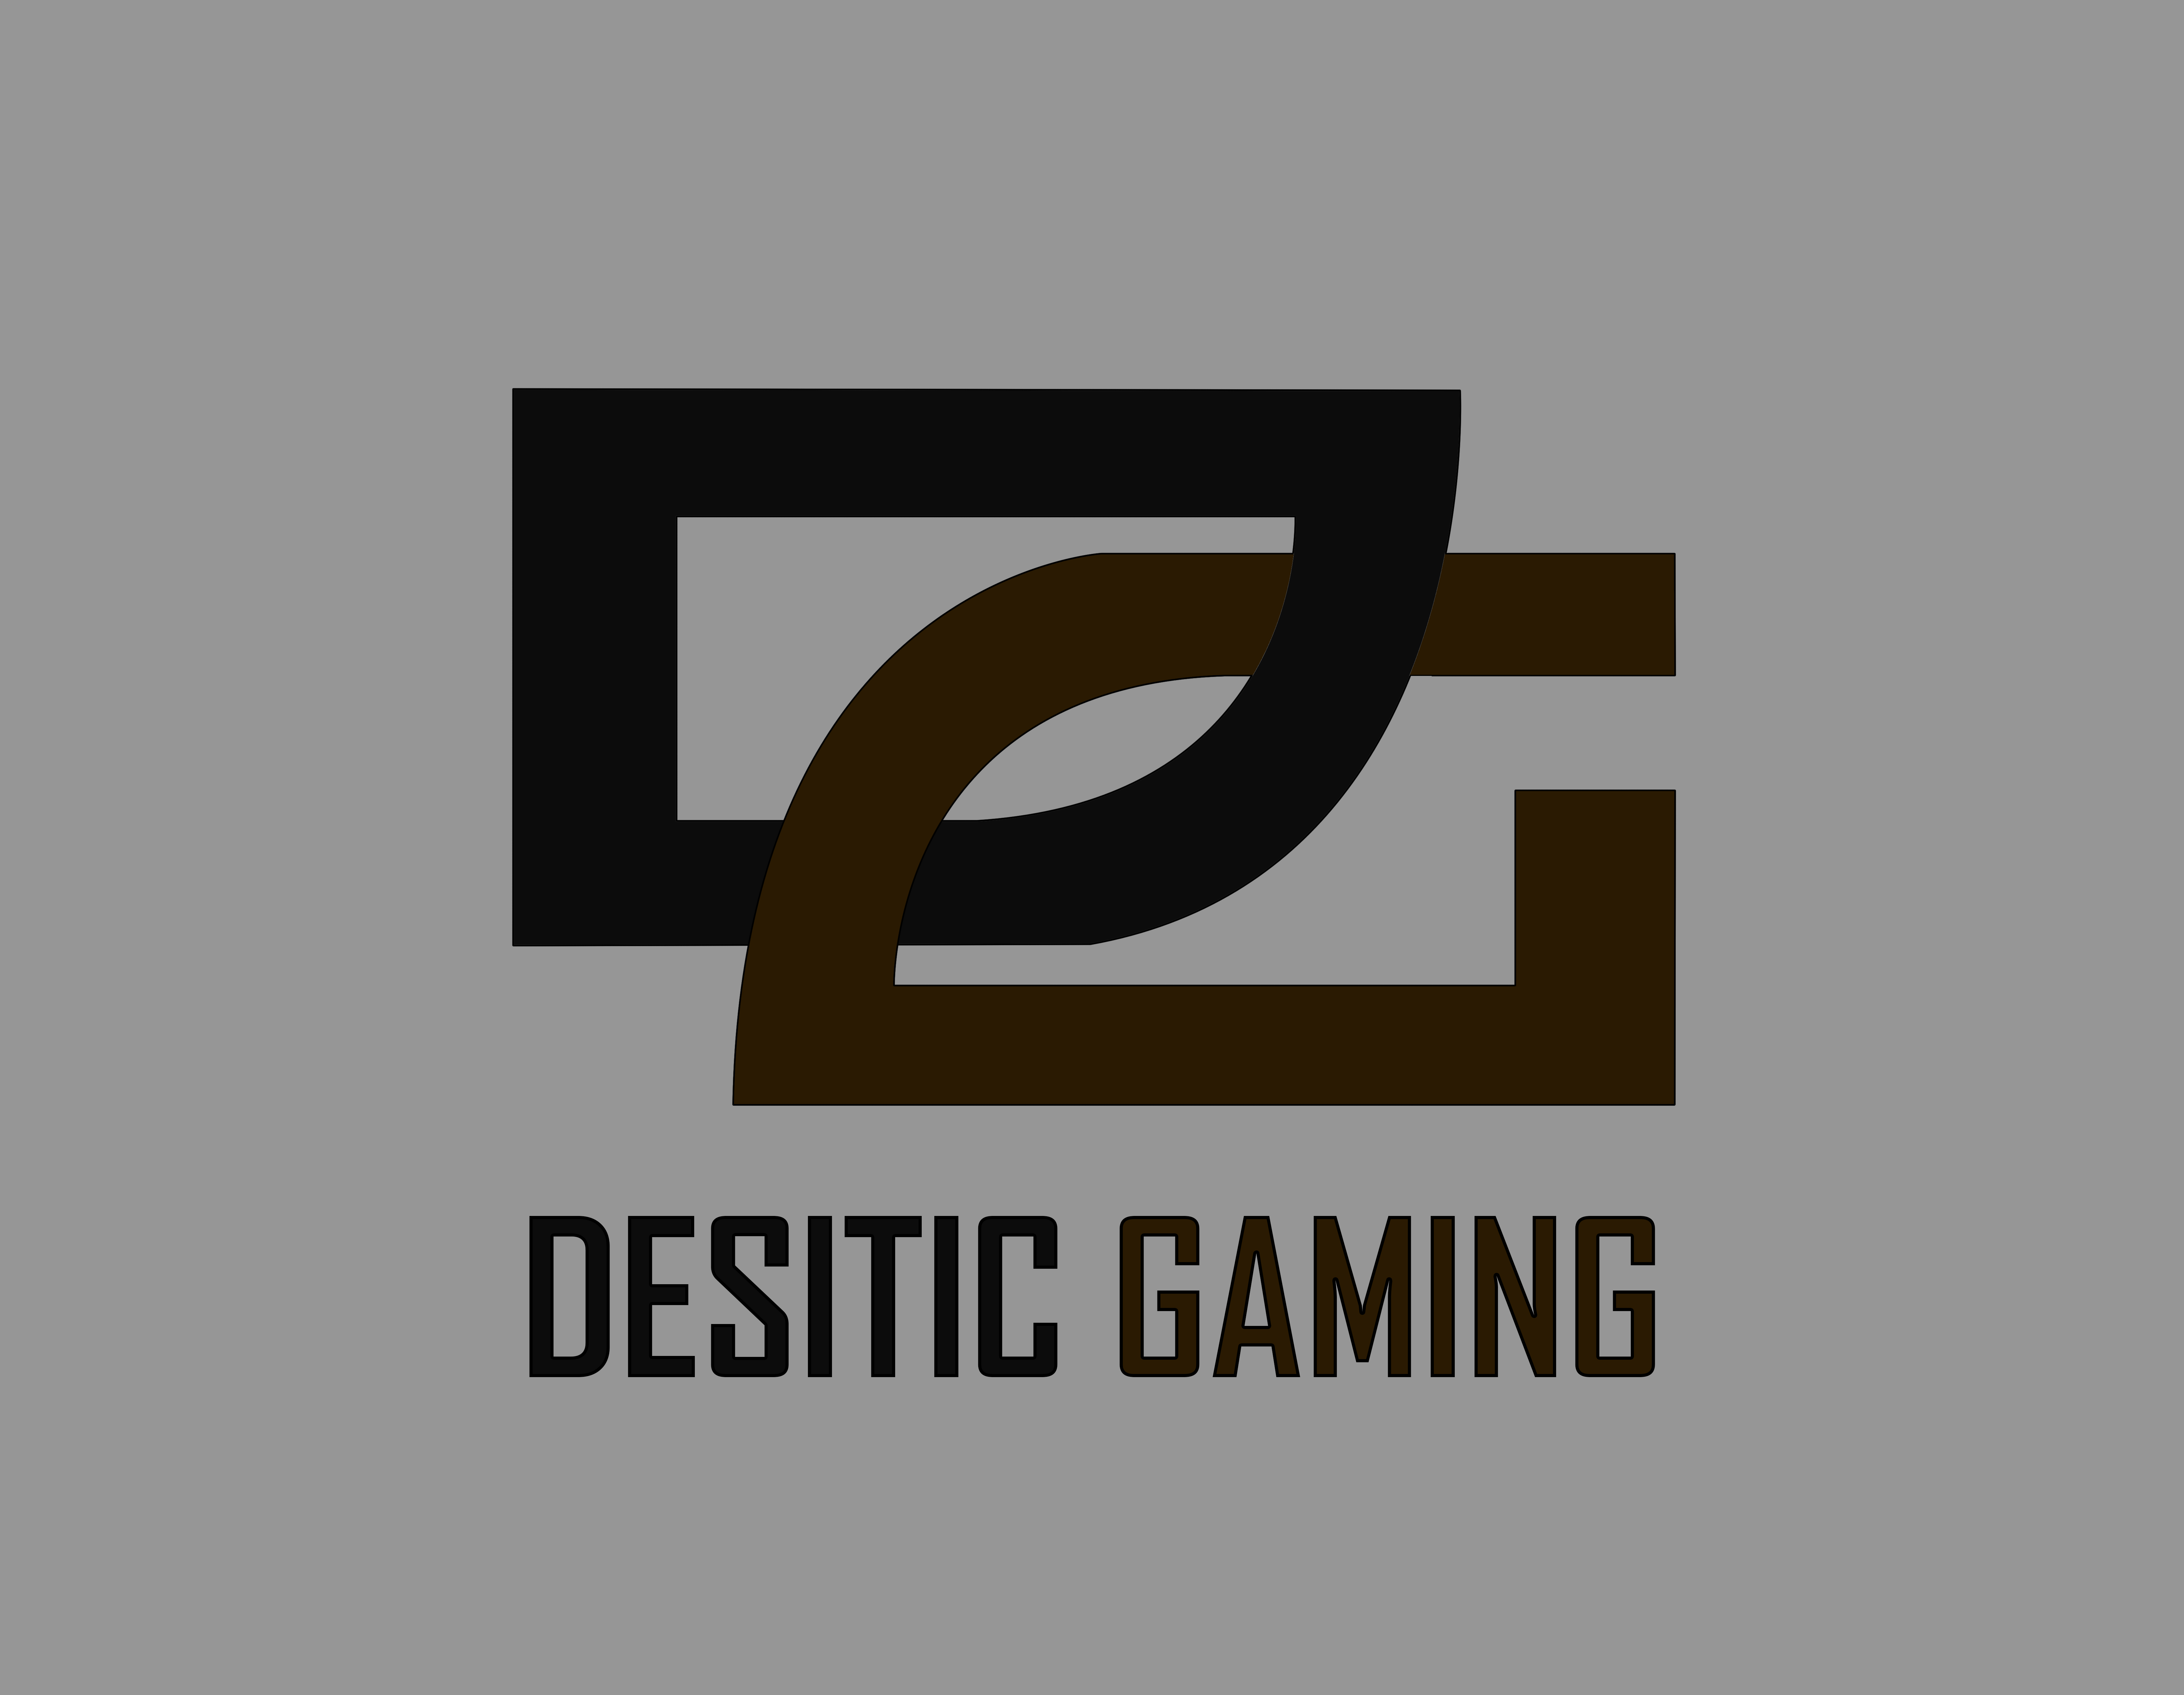 DeSiTic Gaming's logo